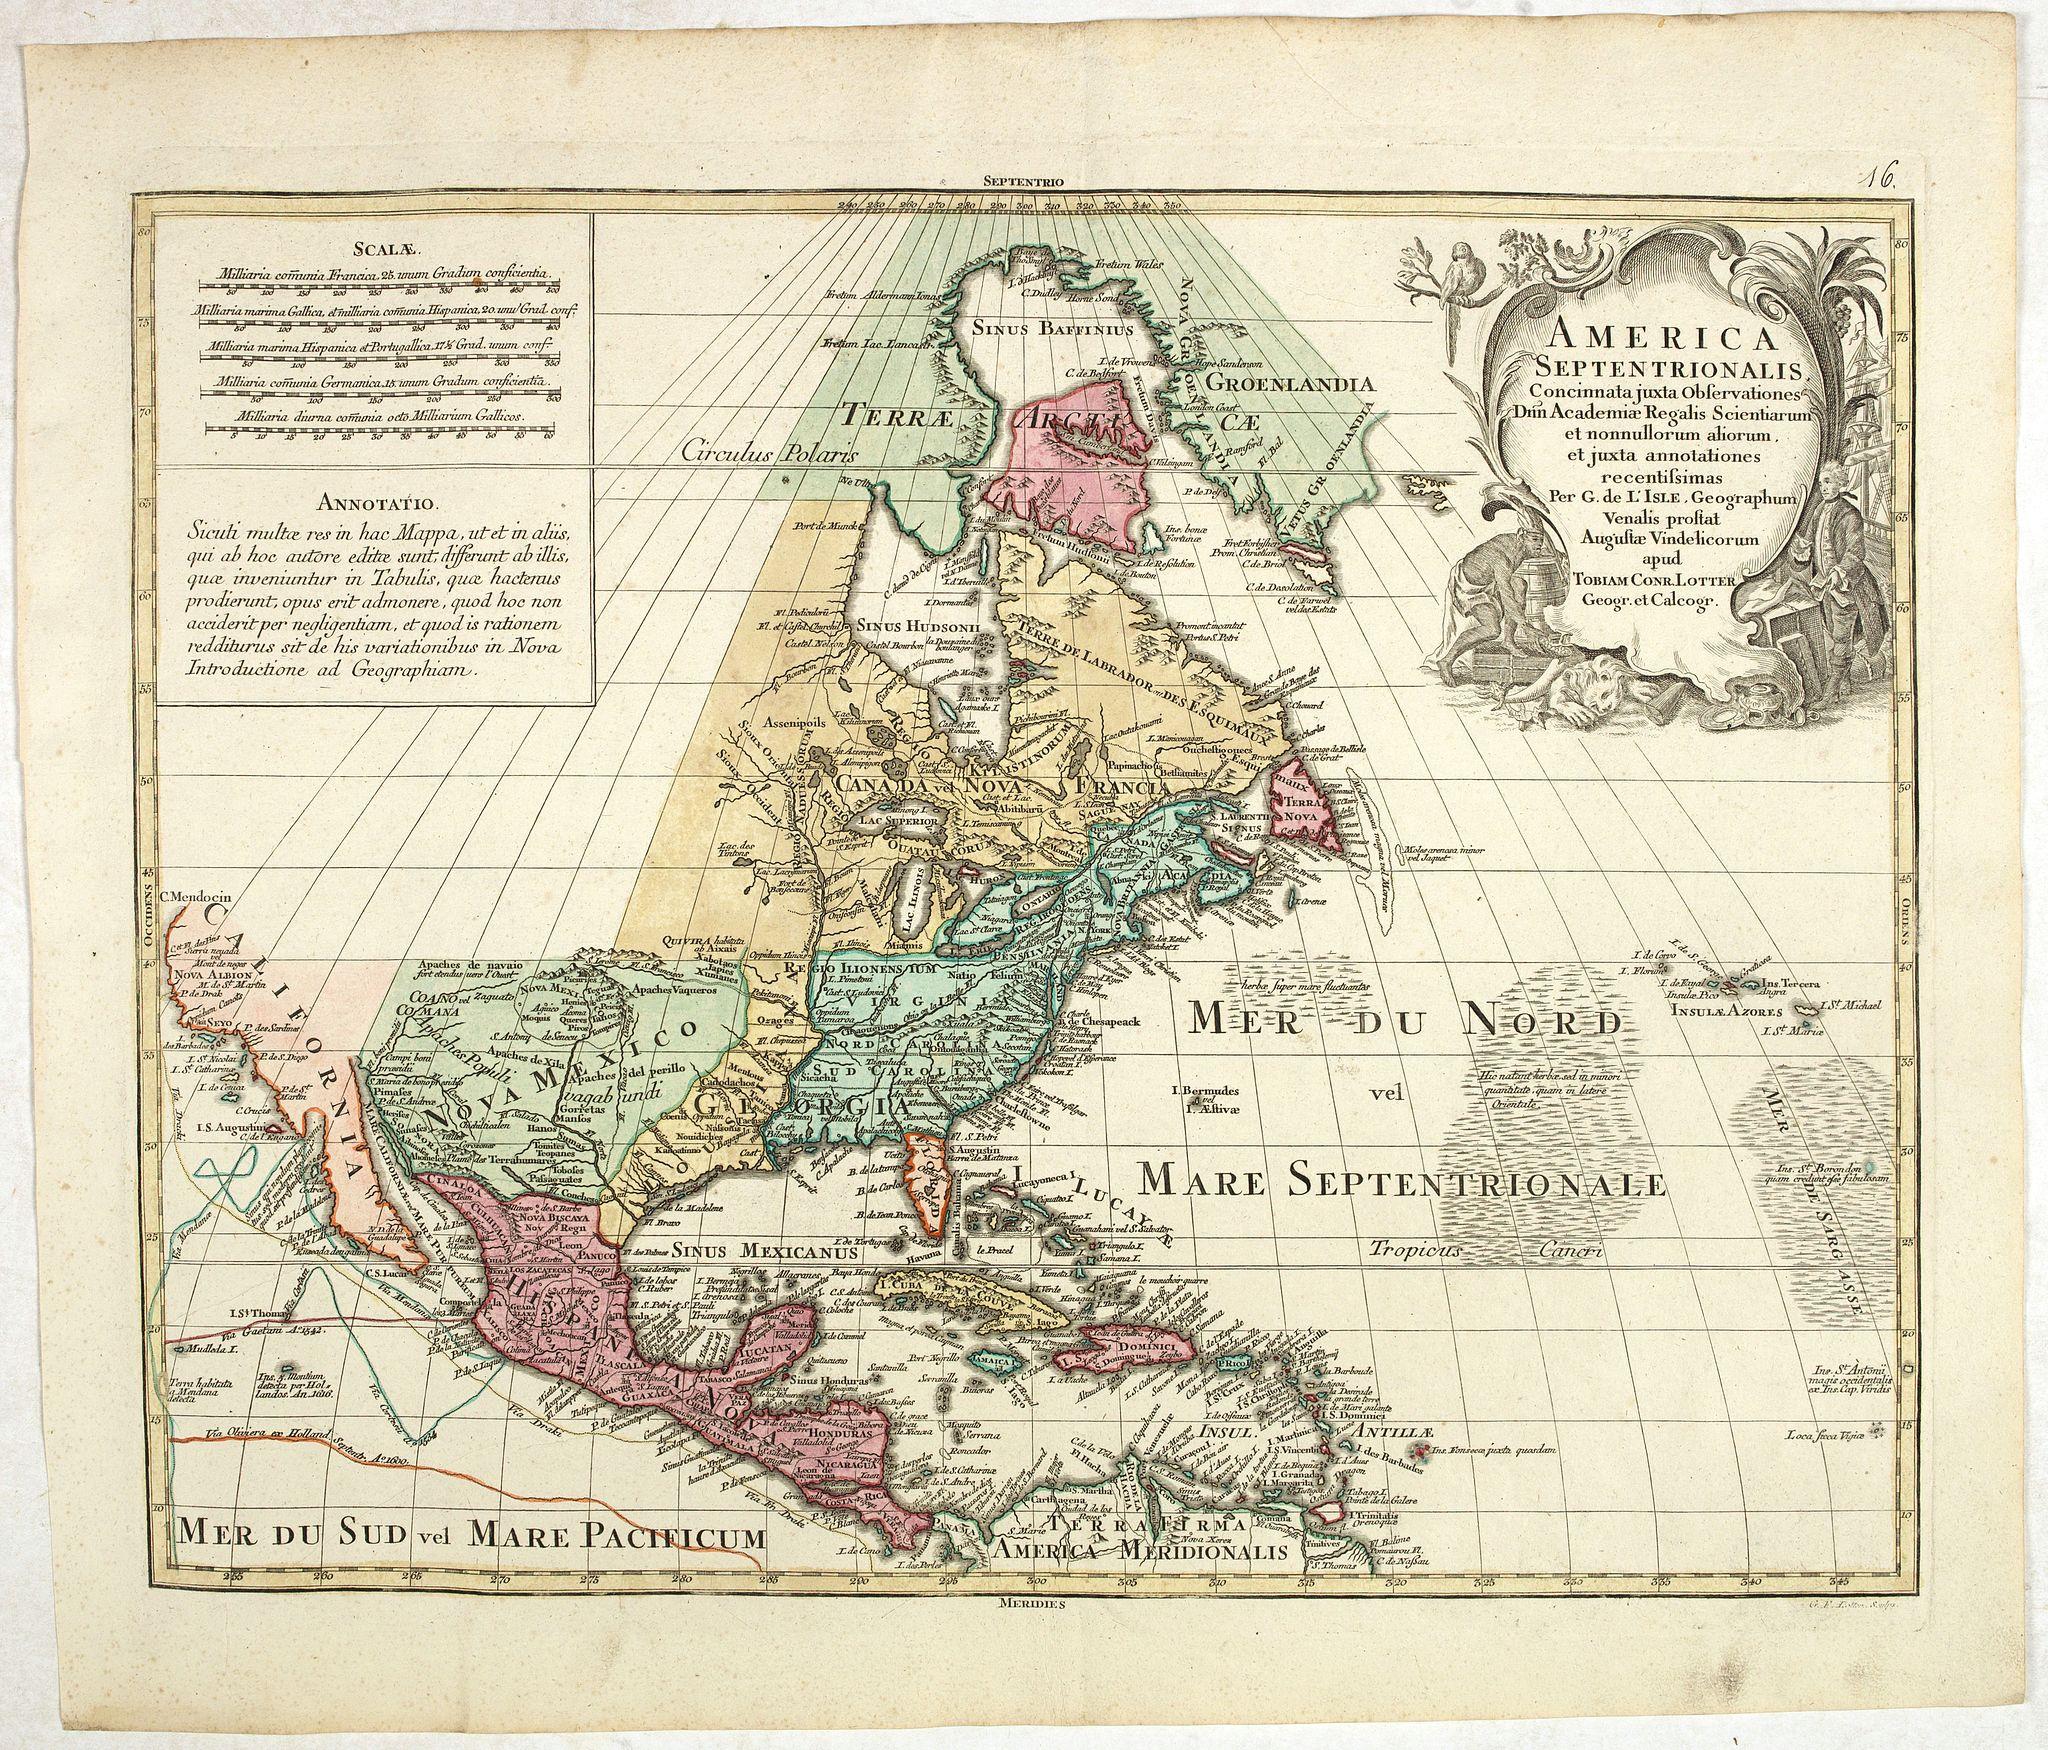 LOTTER, T.C. -  America Septentrionalis, Concinnata juxta Observationes. . .